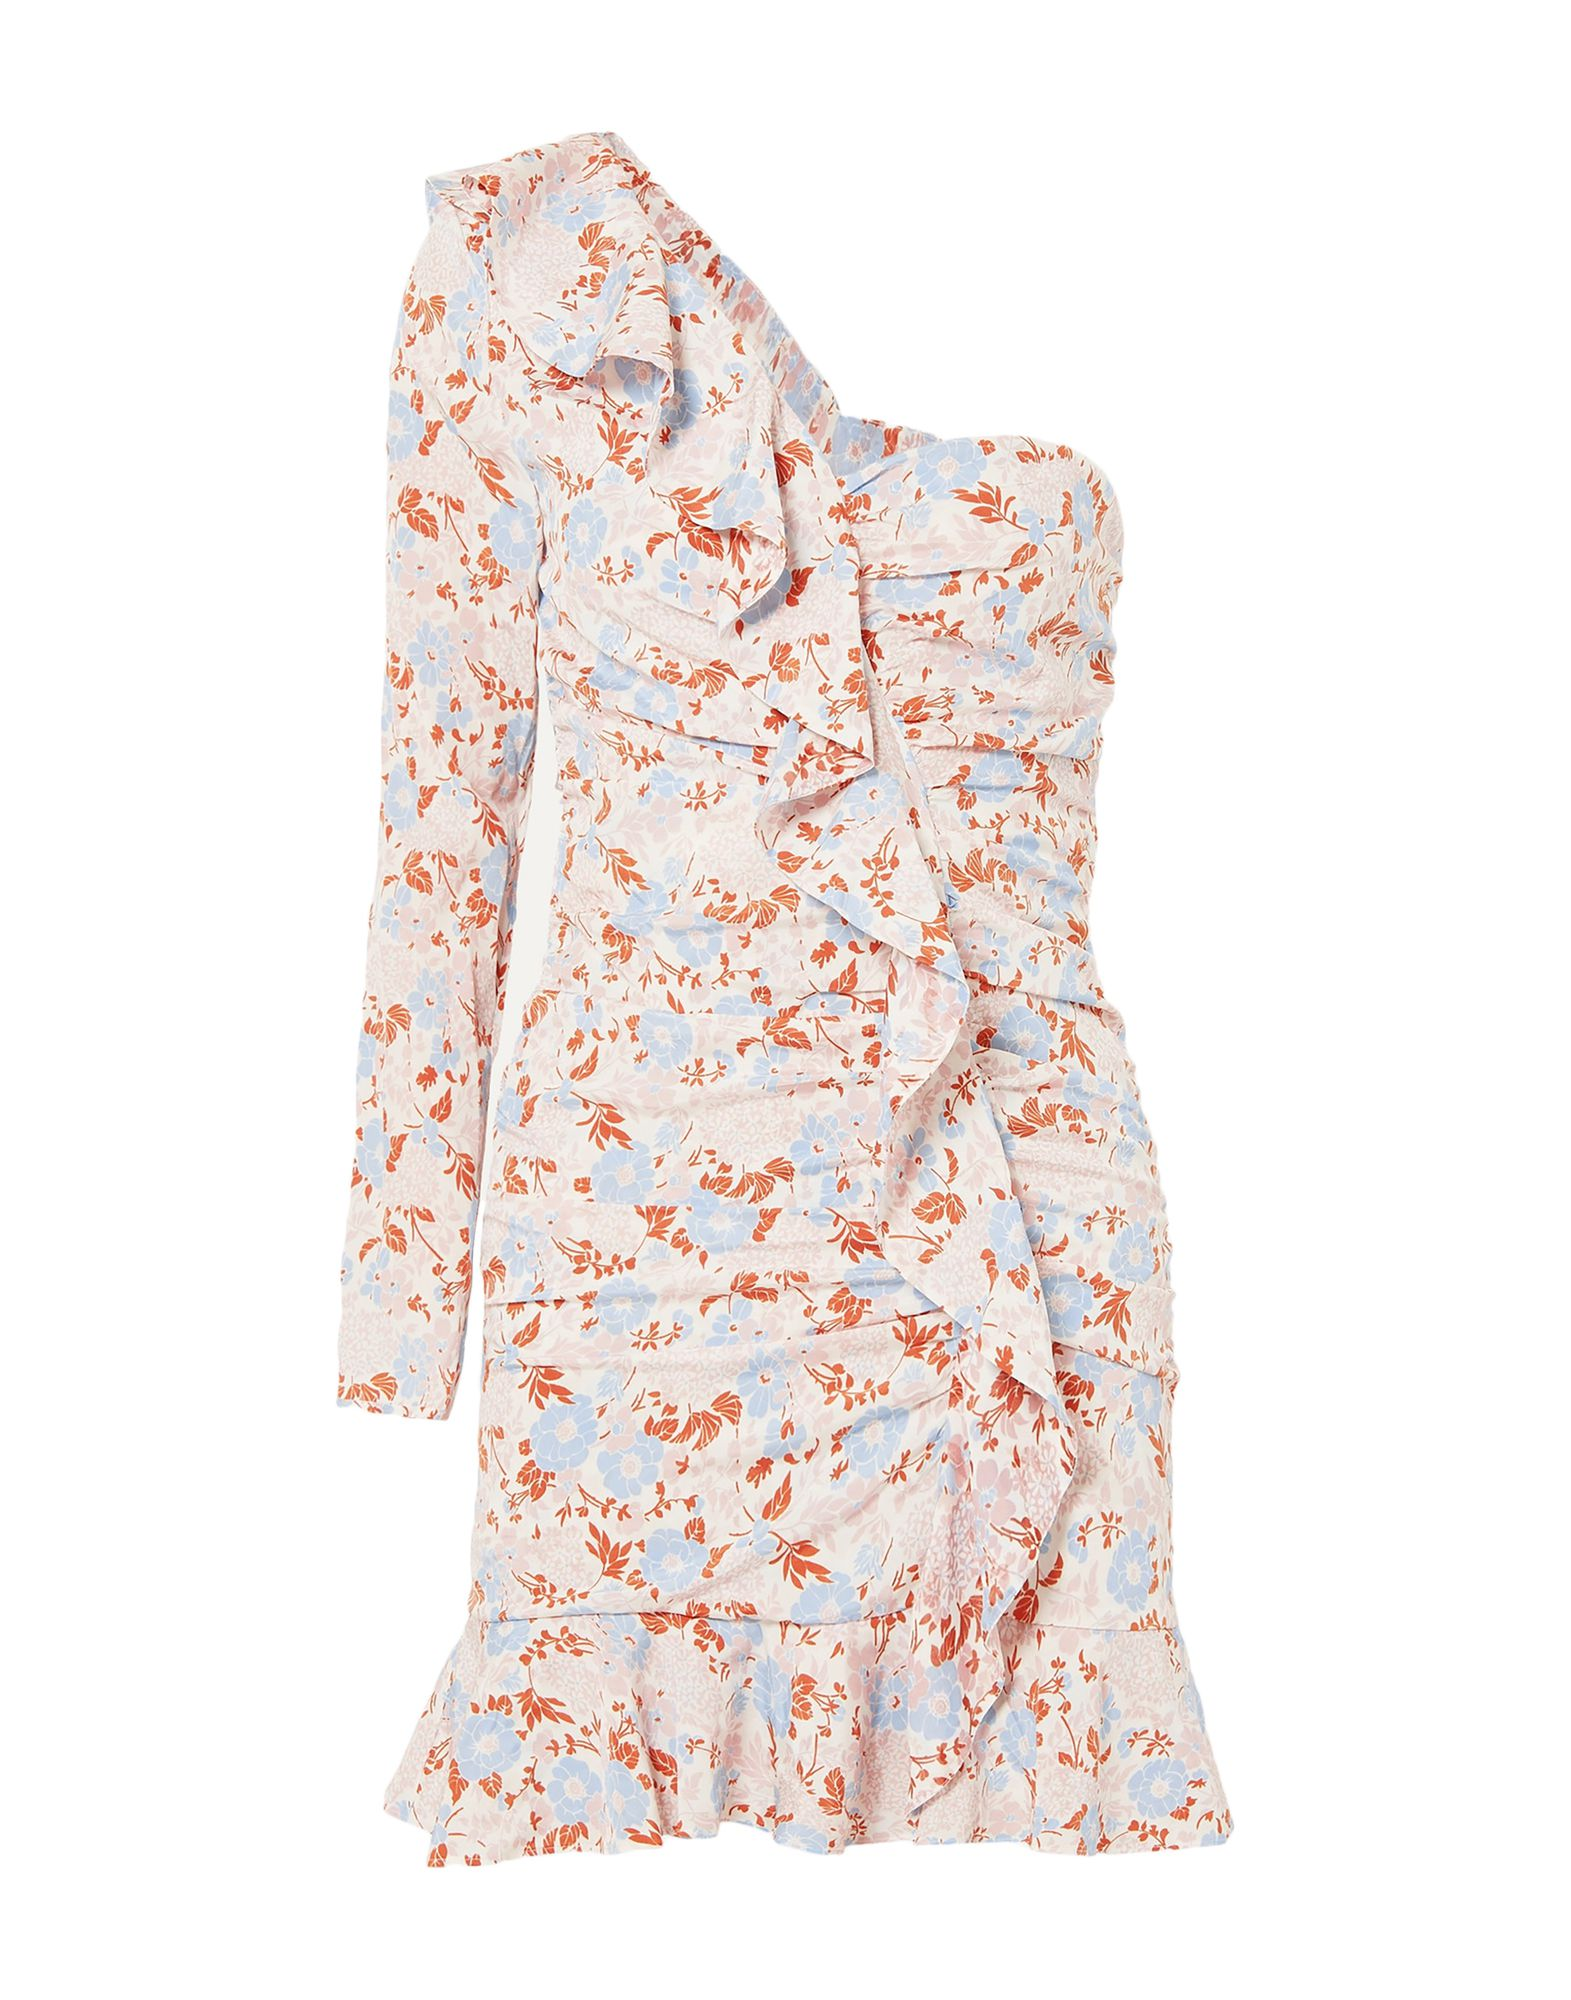 VERONICA BEARD Short dresses. crepe, no appliqués, floral design, wide neckline, long sleeves, no pockets, side closure, zipper closure, fully lined, stretch. 91% Silk, 9% Elastane